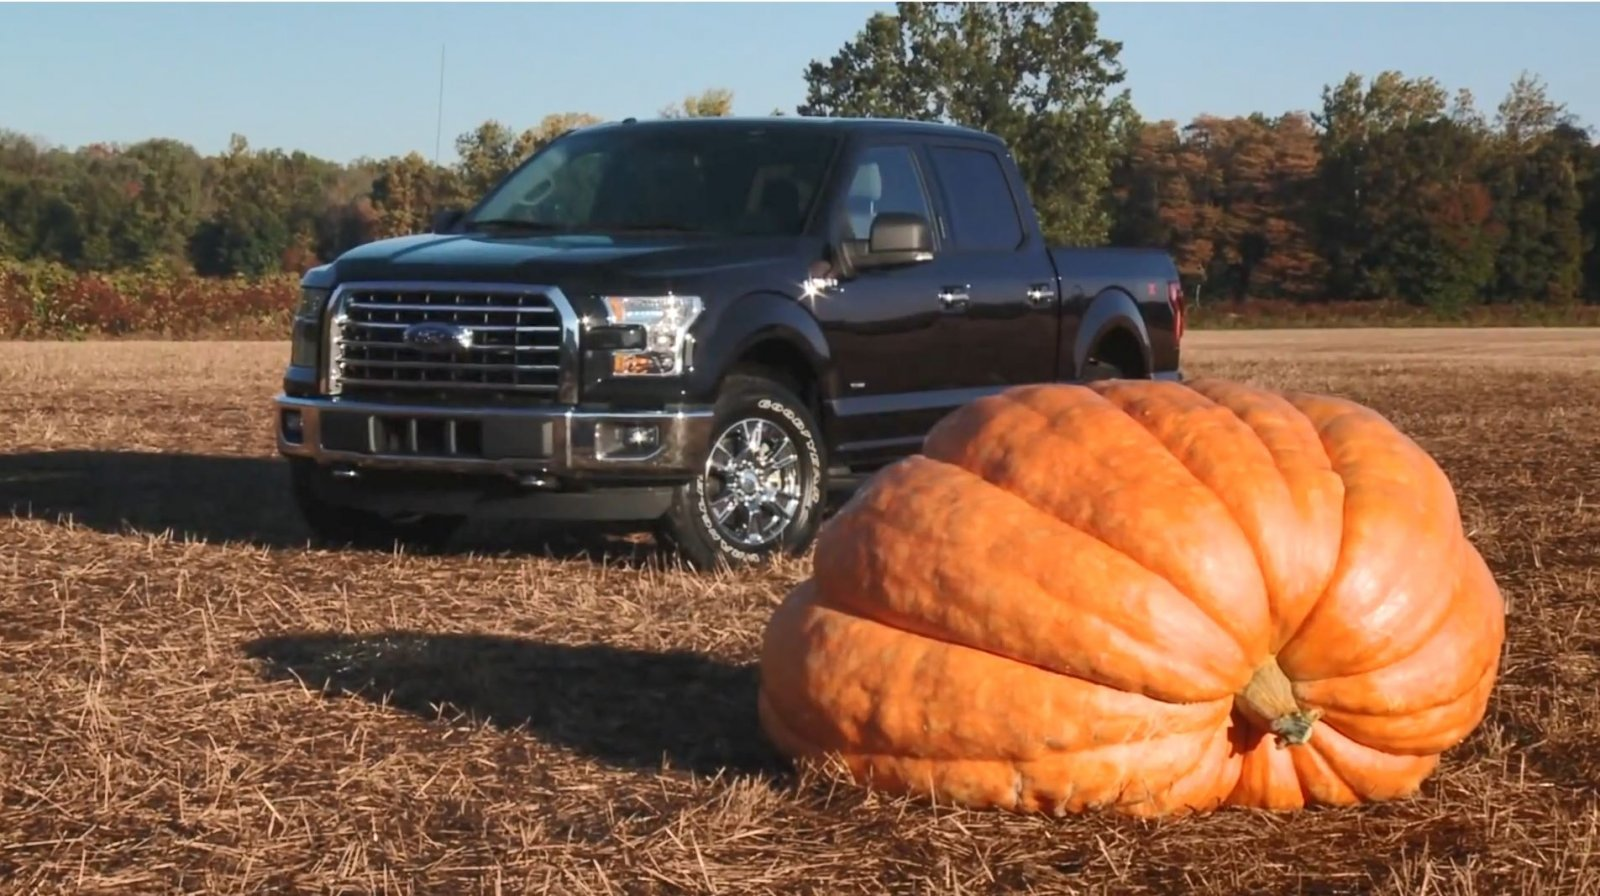 Ford F150 Hauling 1,200 Pound Giant Pumpkin 3.JPG